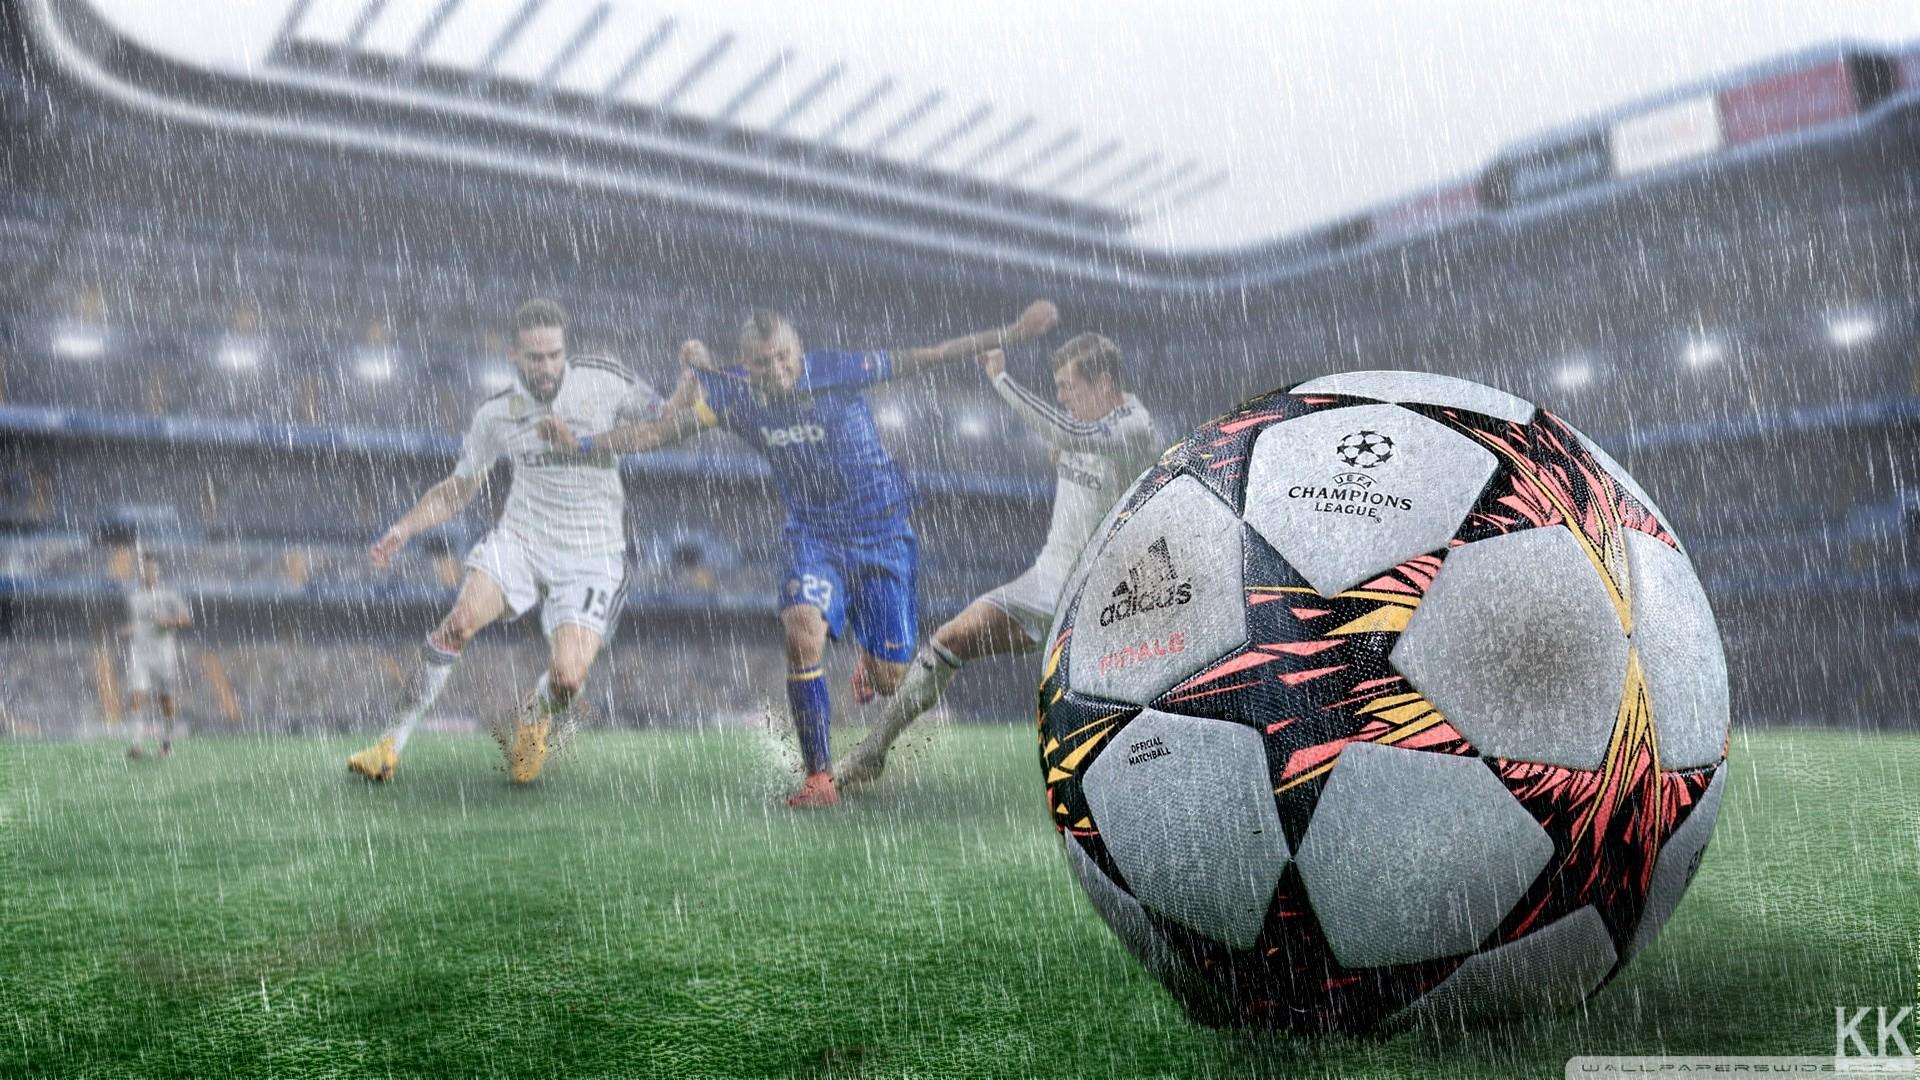 Download Football Ipad Wallpaper Gallery: Football HD Wallpapers 1080p (83+ Images